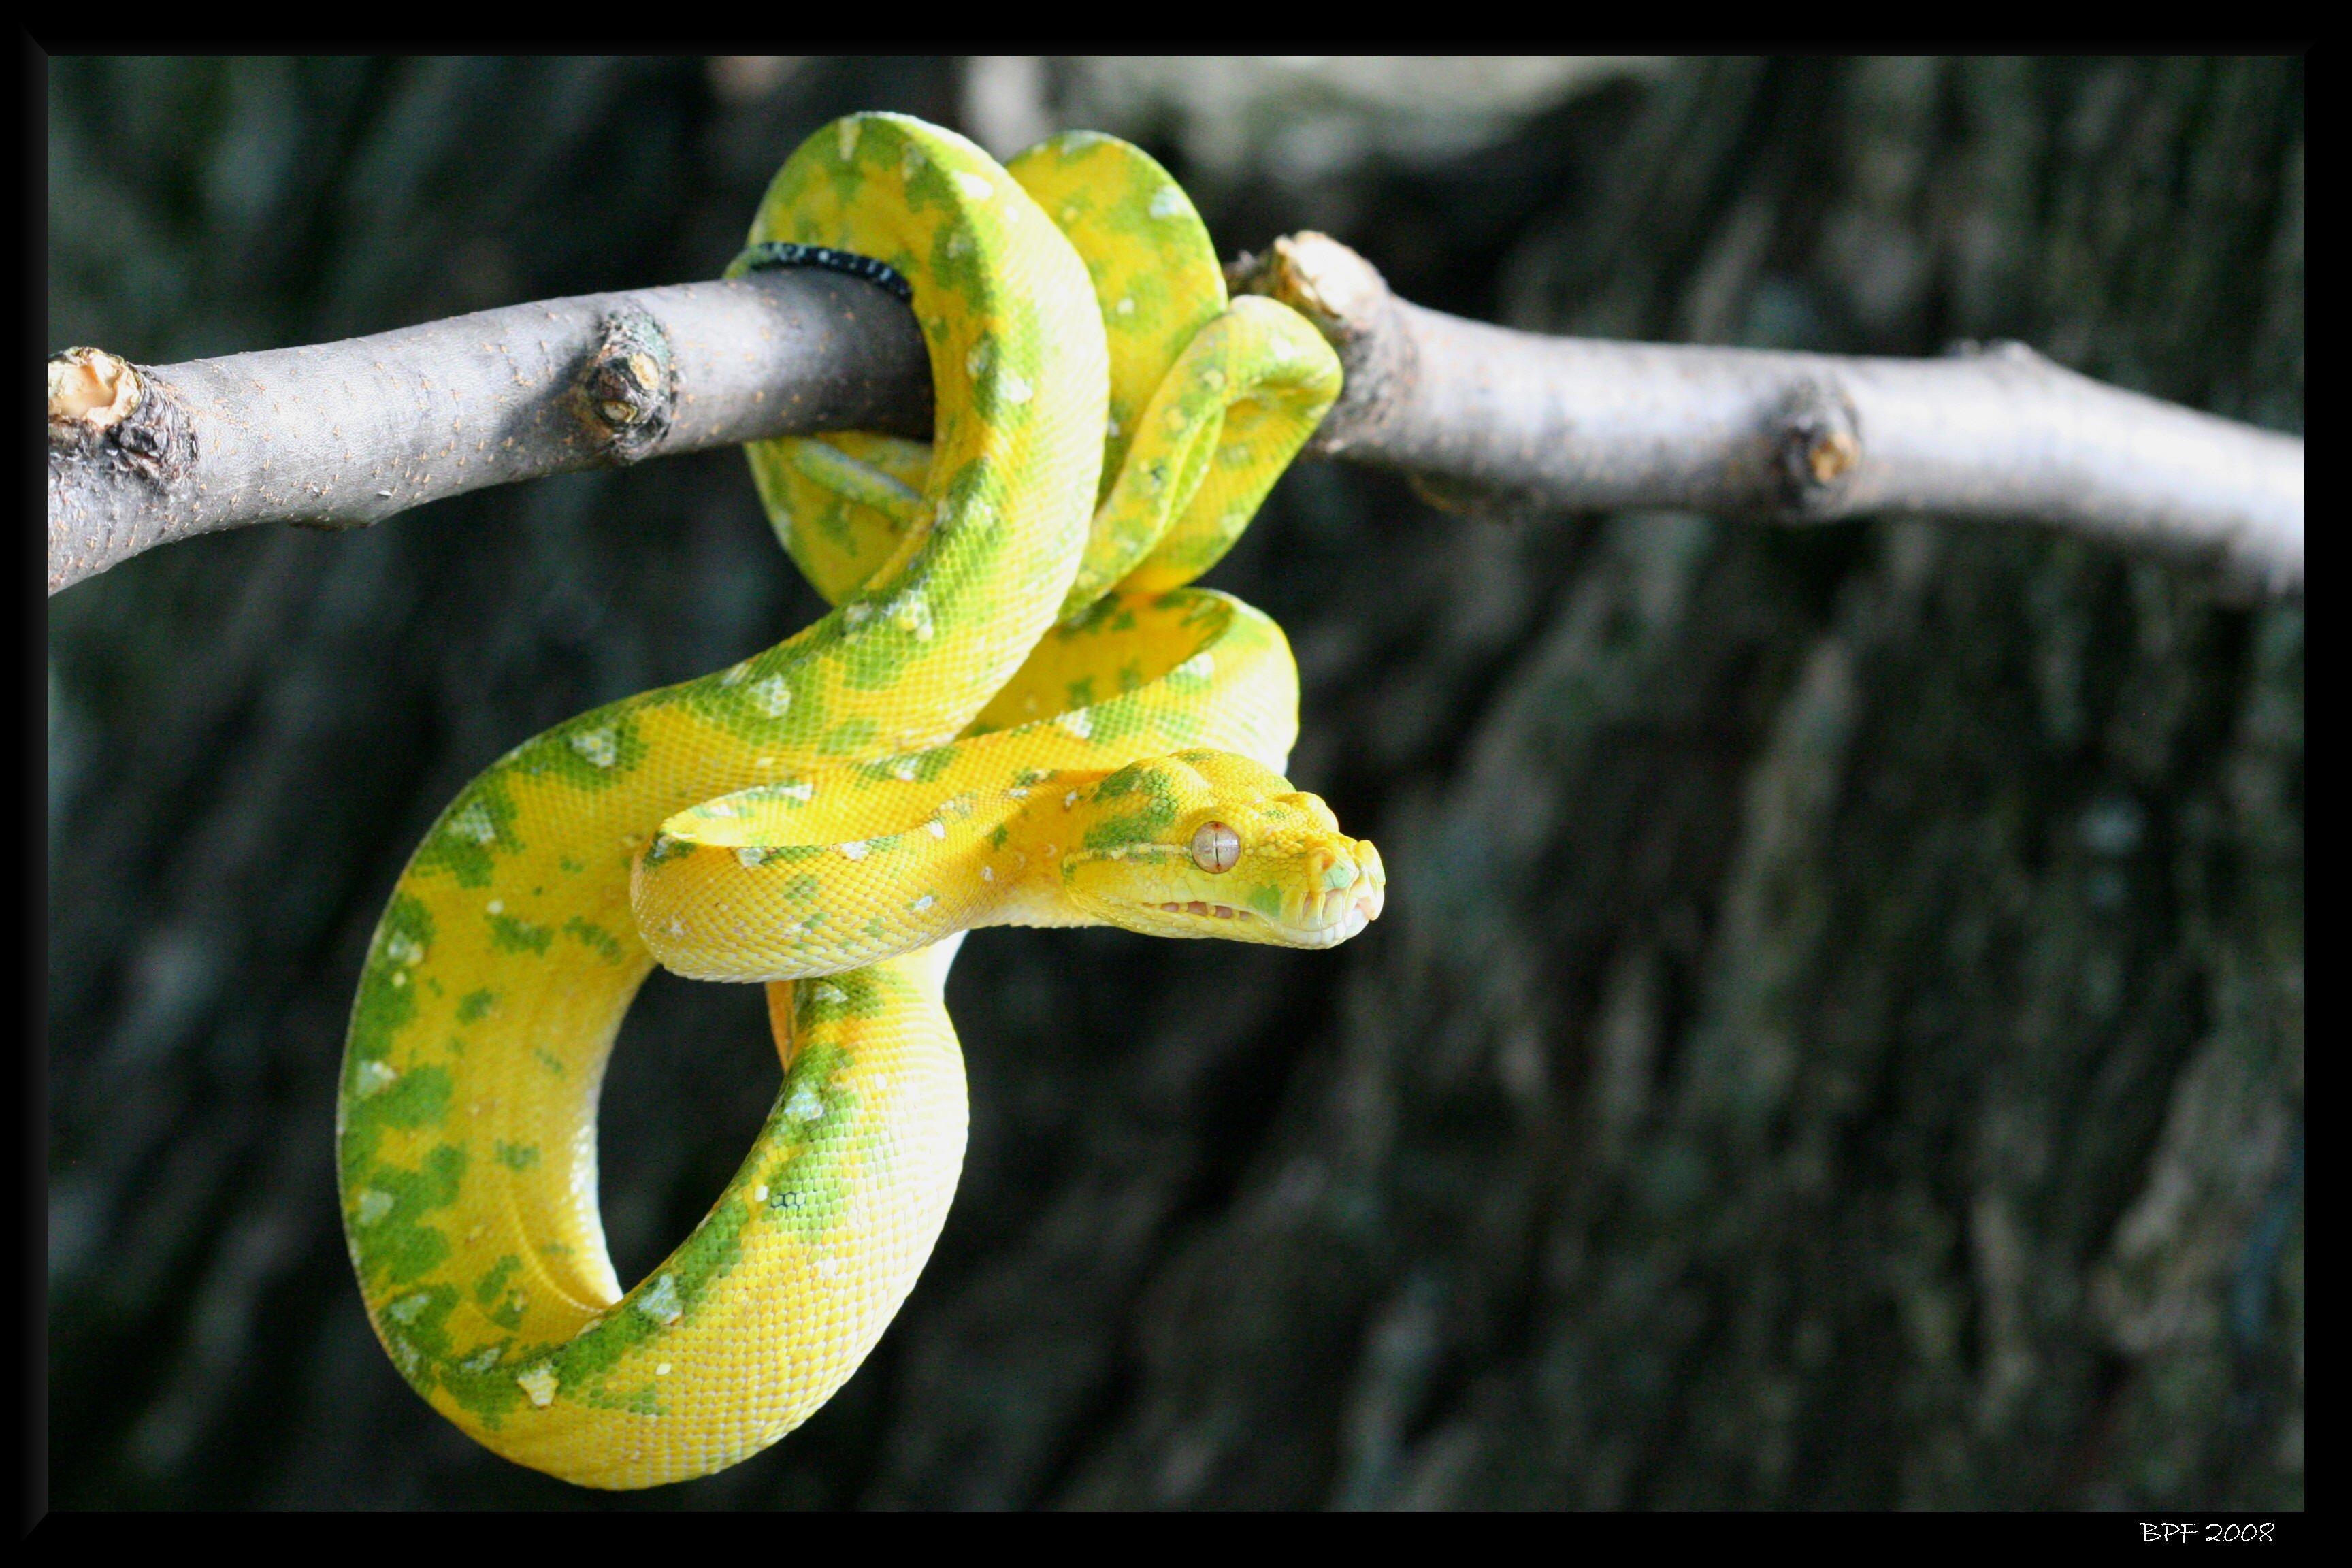 Green Tree Python (Morelia viridis) by bpfischer